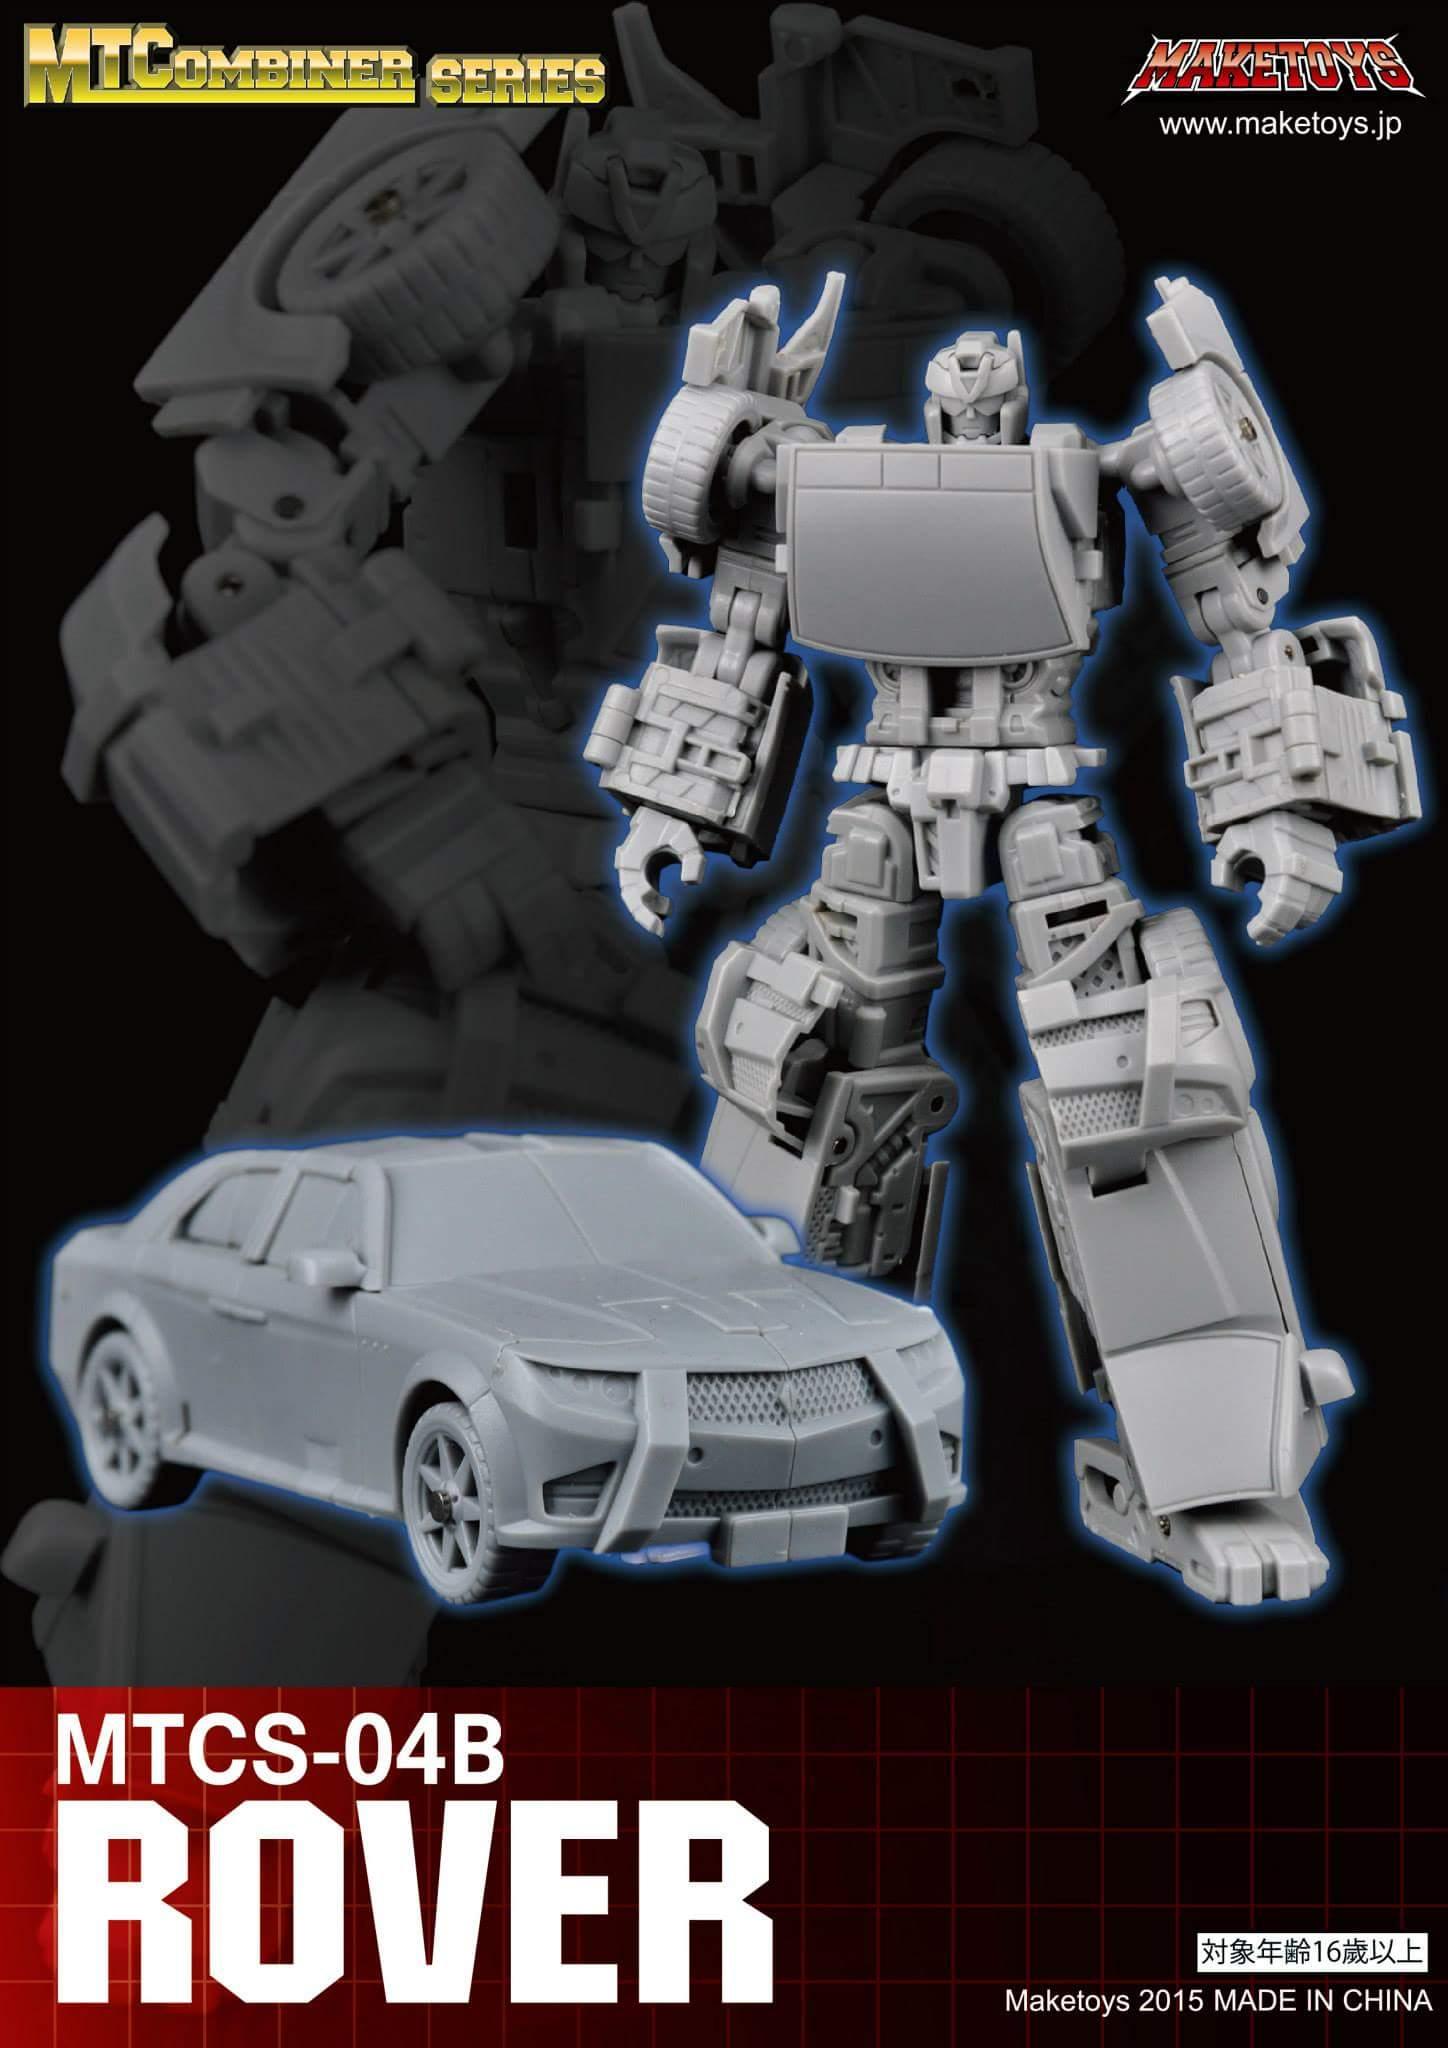 [MakeToys] Produit Tiers - Jouet MTCM-04 Guardia (aka Protectobots - Defensor/Defenso) 29437620150610091733